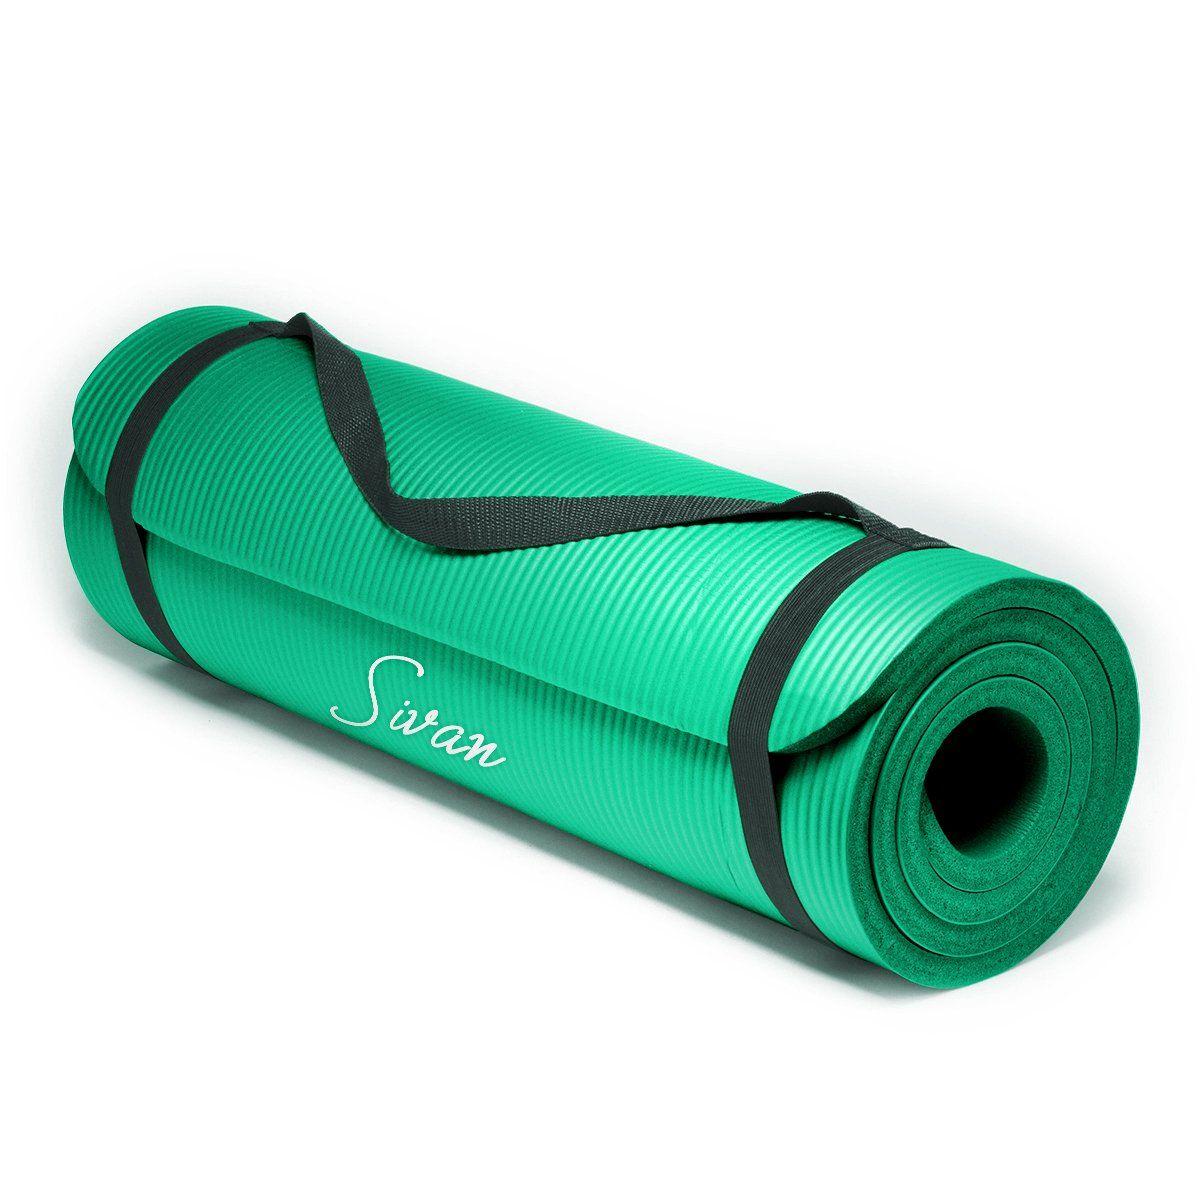 19 99 Amazon Com Sivan Health And Fitness Nbr Yoga And Pilates Mat Blue Hemingweigh Extra Thick Foam Execis Yoga Mats Best Mat Pilates Yoga Mat Reviews